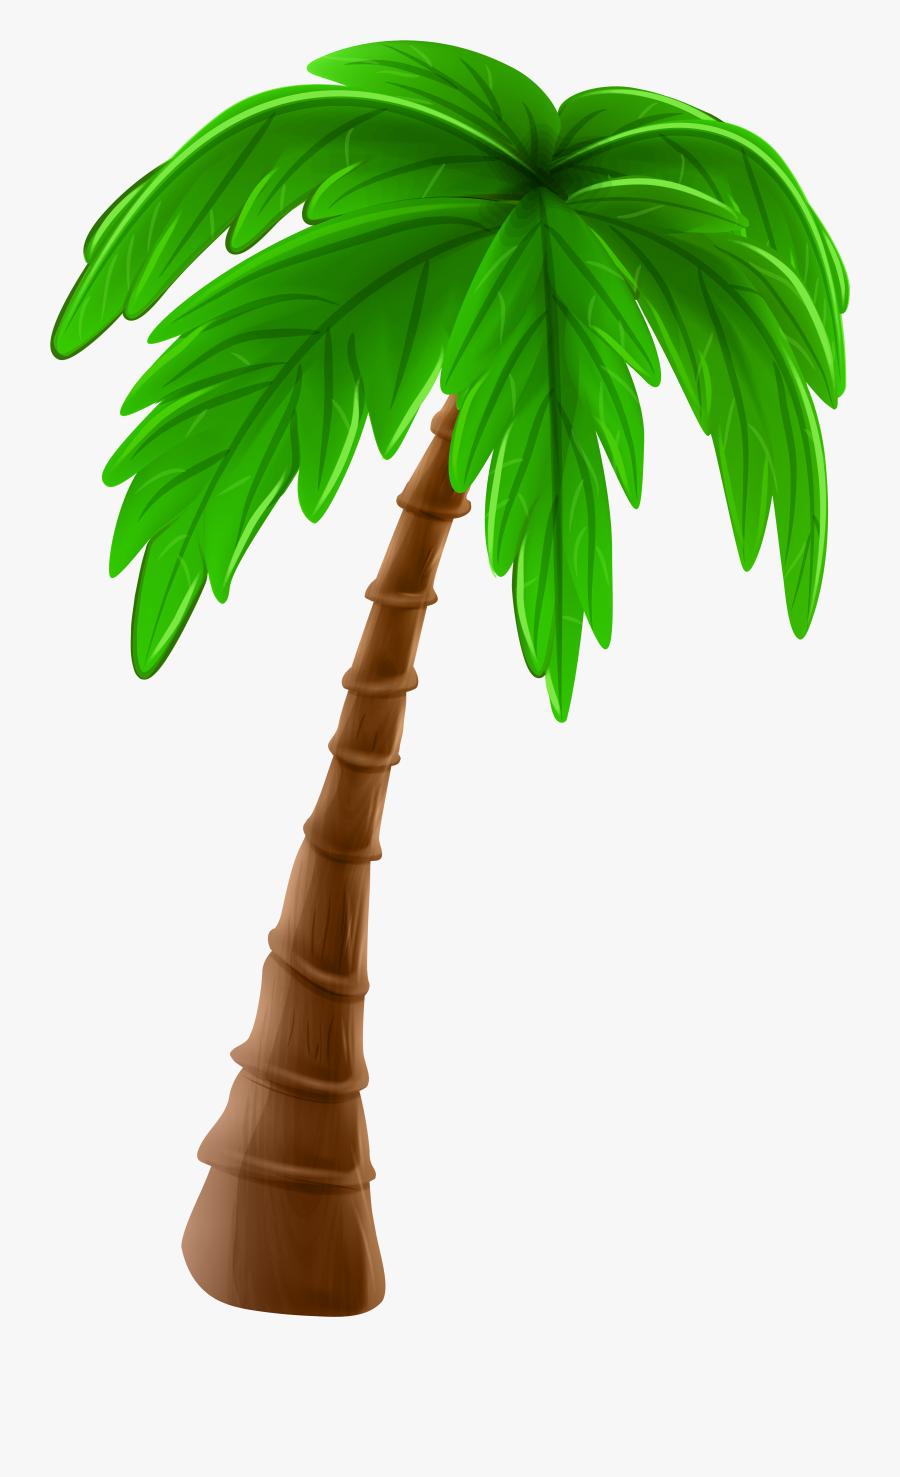 Free To Use & Public Domain Palm Tree Clip Art - Cartoon Transparent Coconut Tree Png, Transparent Clipart